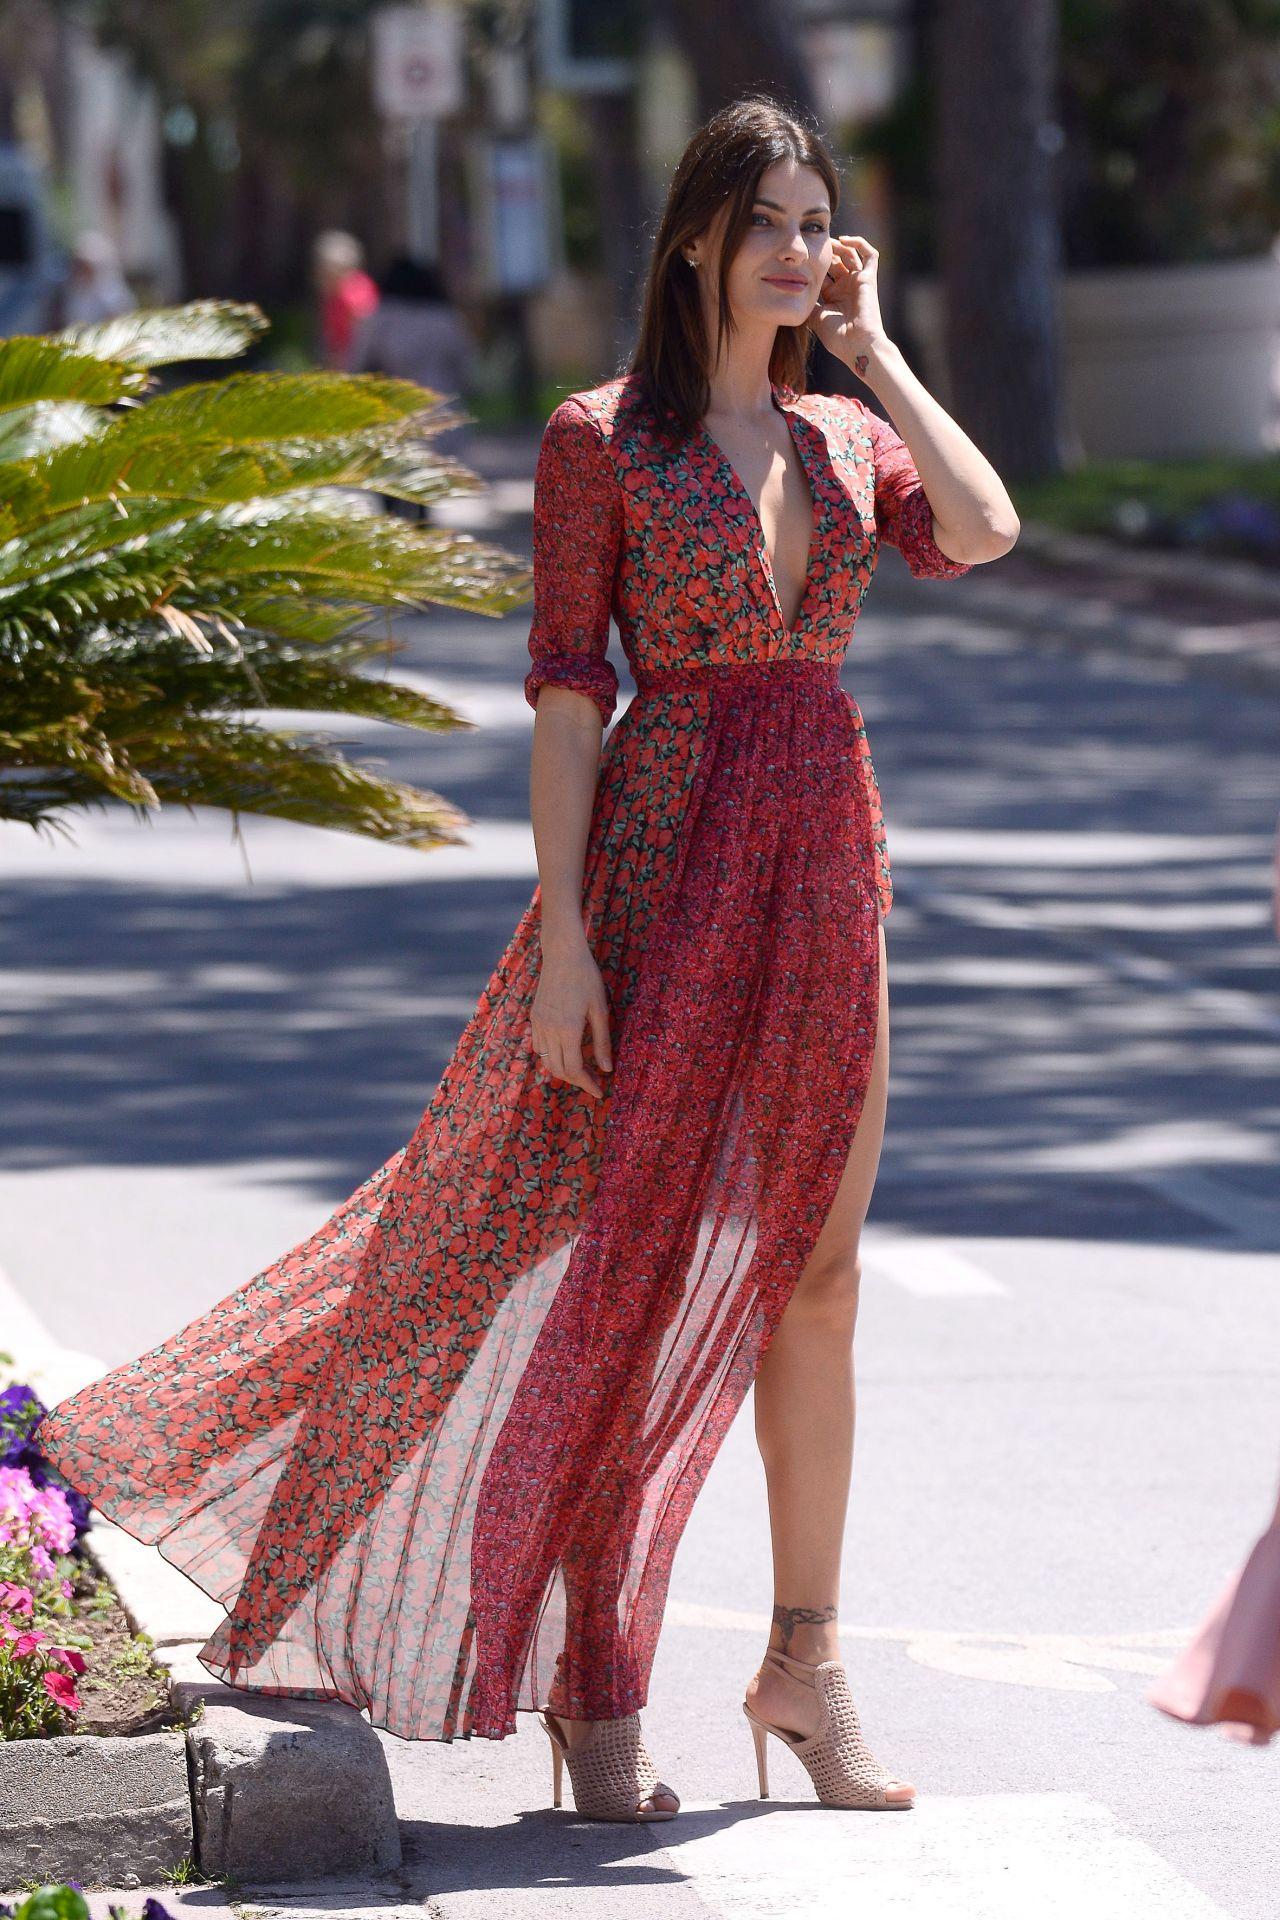 Isabeli Fontana Style And Fashion Cannes 05 18 2018